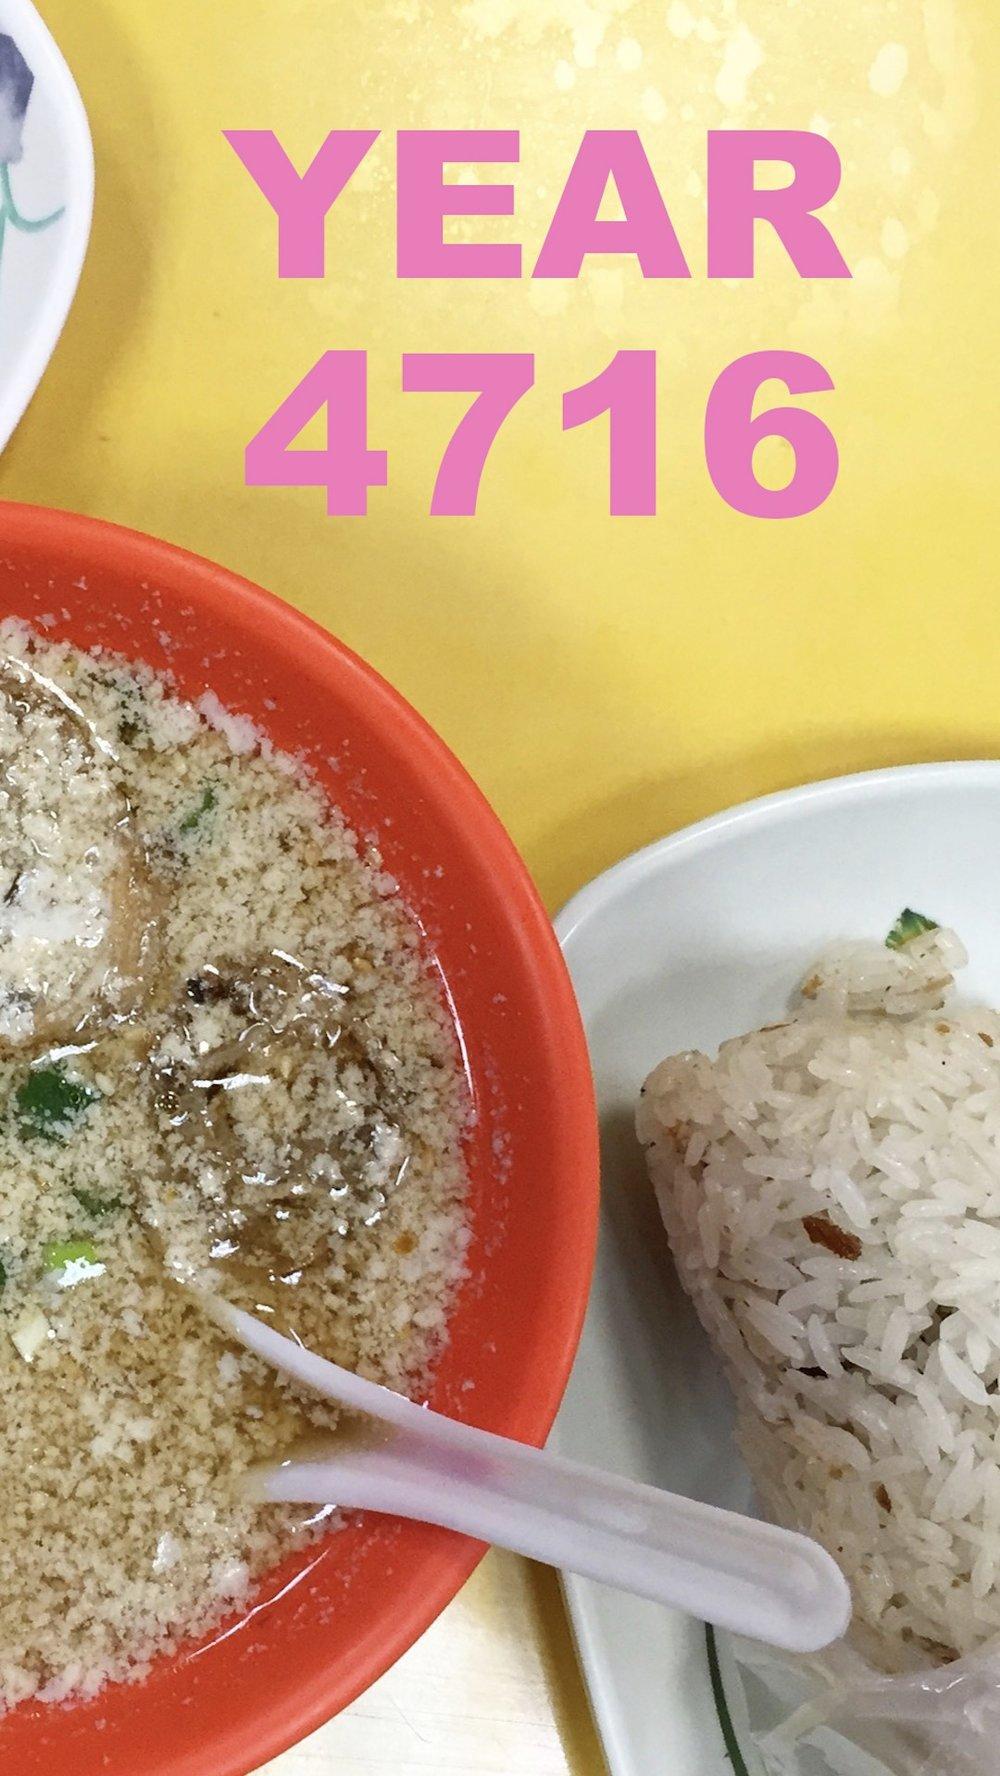 """Breakfast in Taipei in year 4716"" by Howie Chen  5th Day"